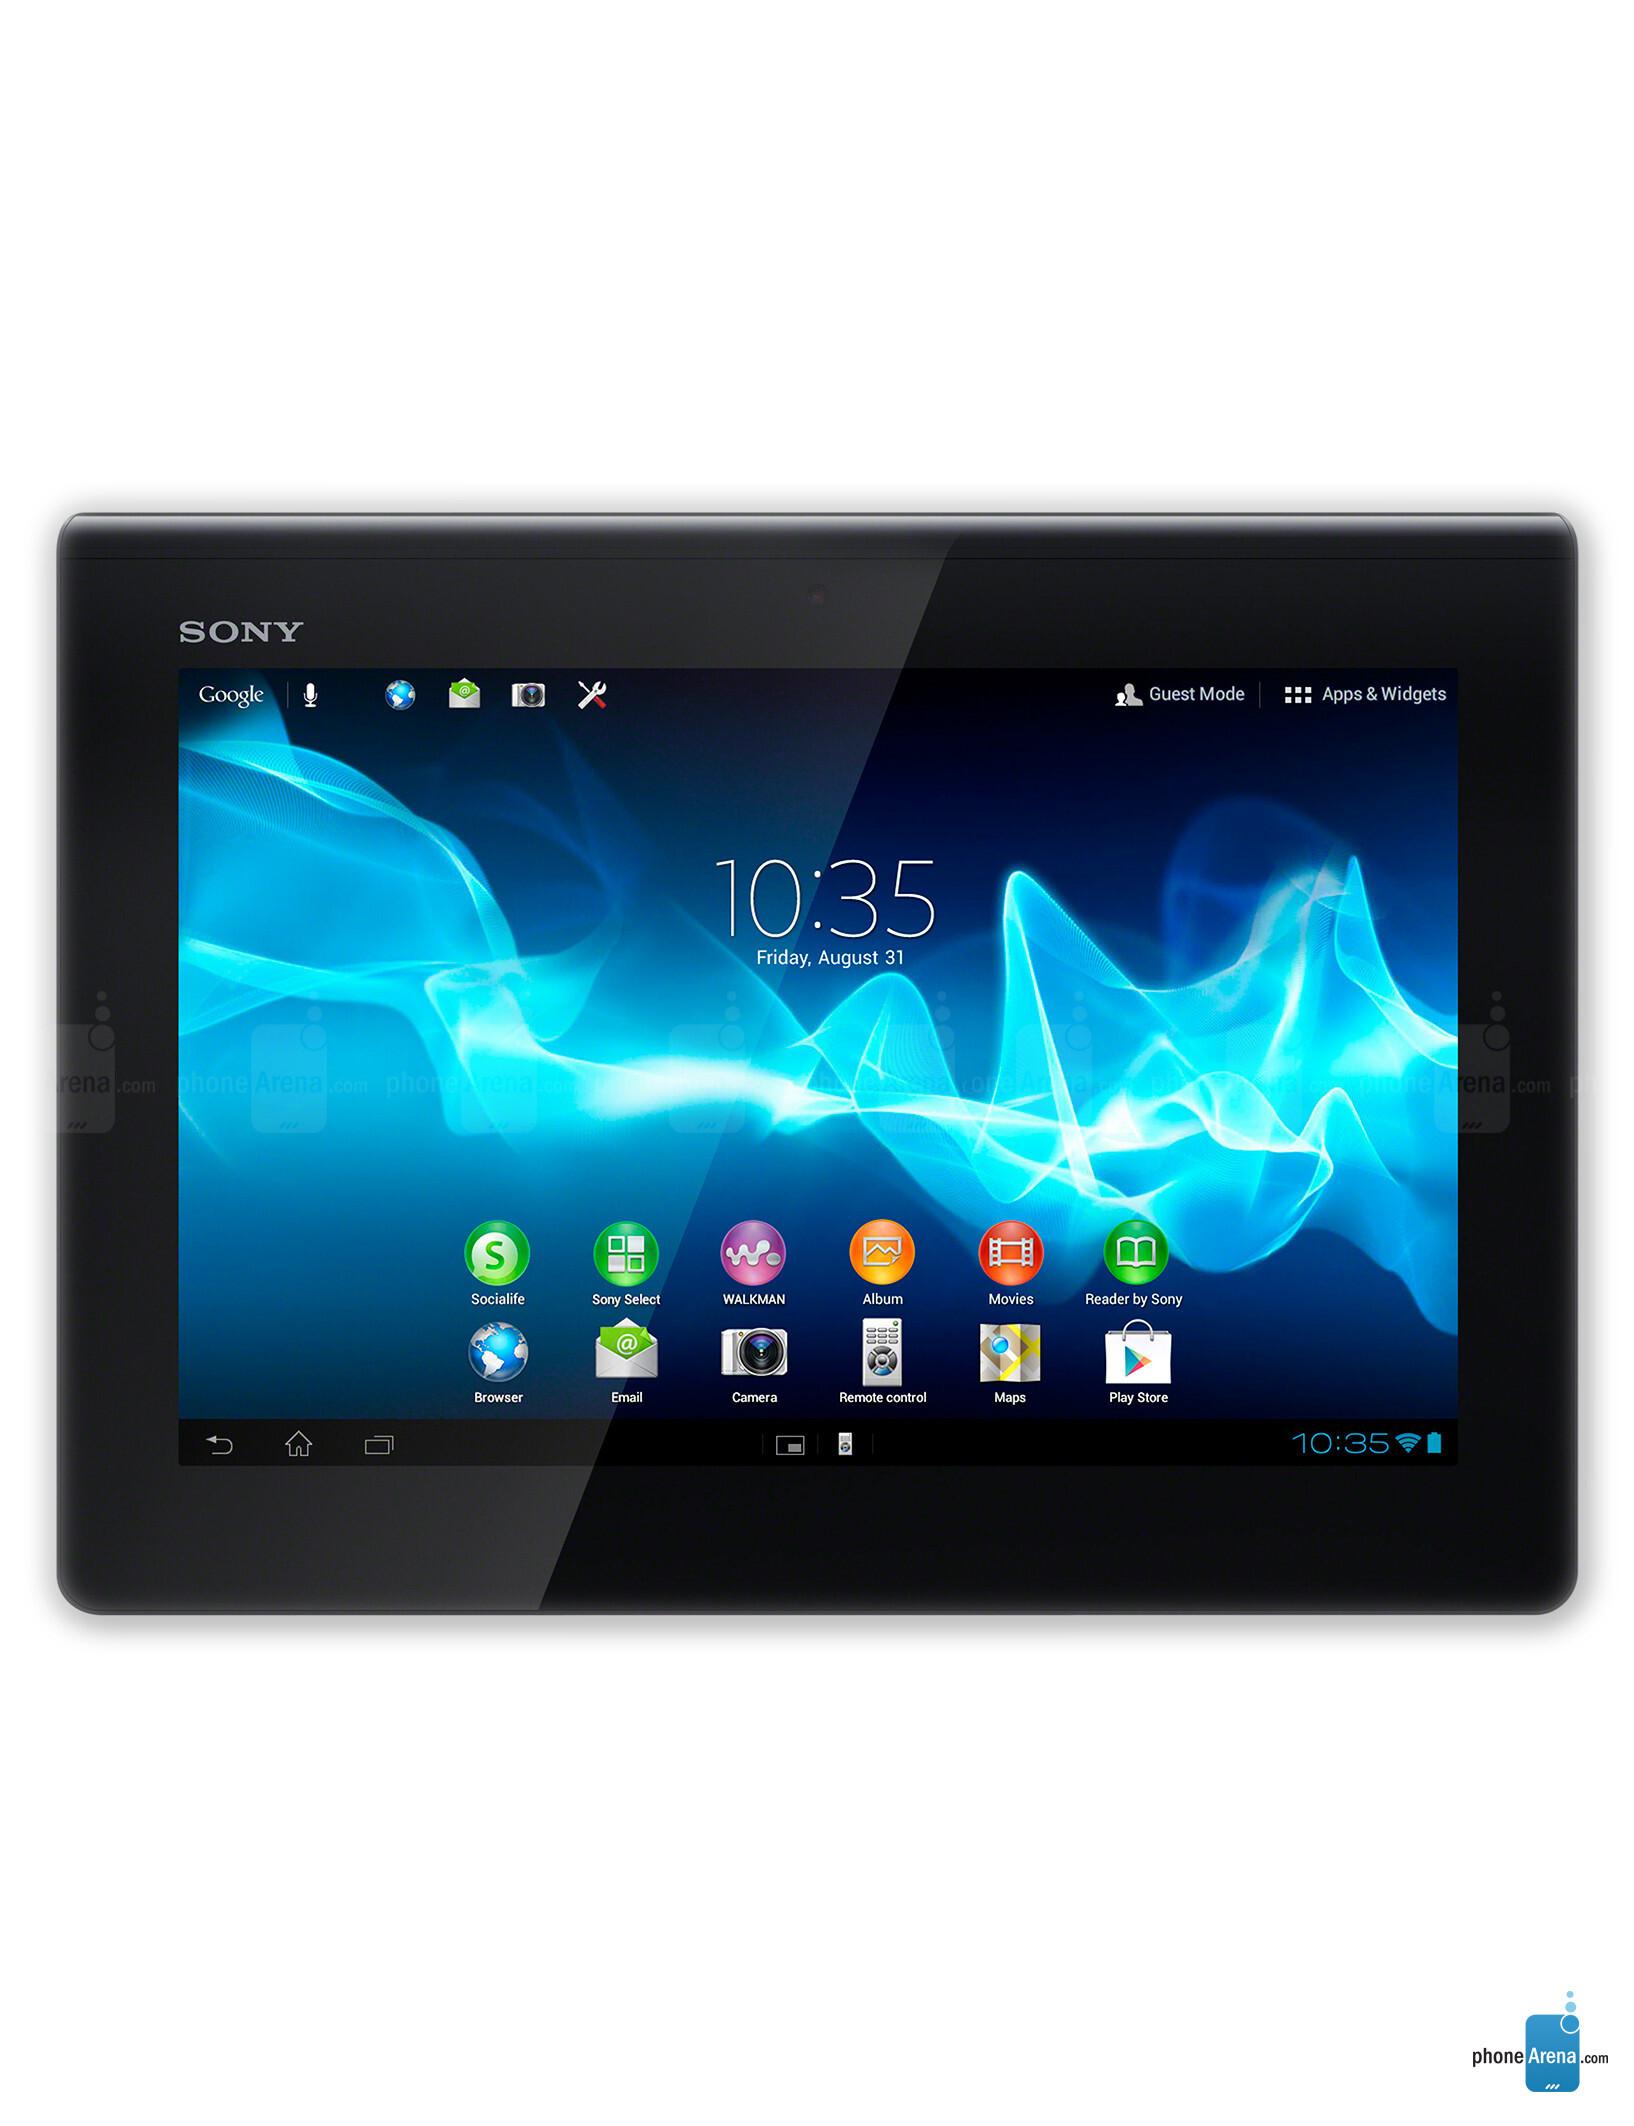 Manual. Sony Xperia Tablet S